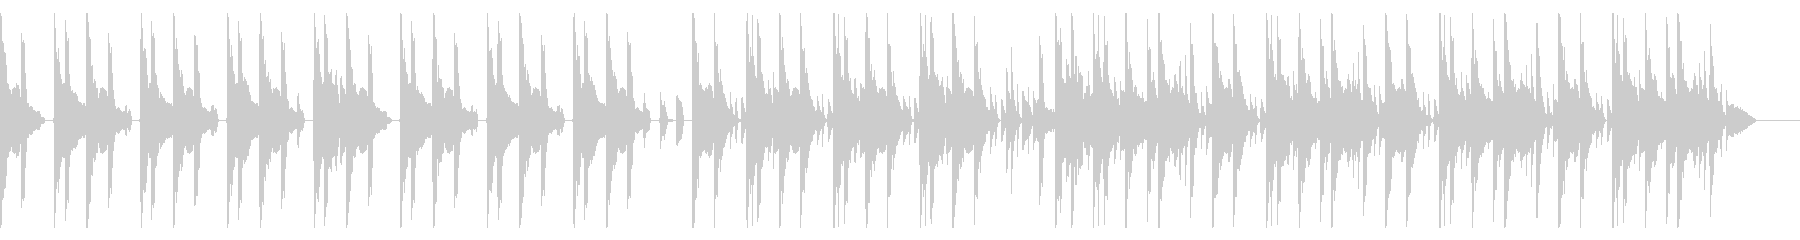 167 BPMの未再生の波形